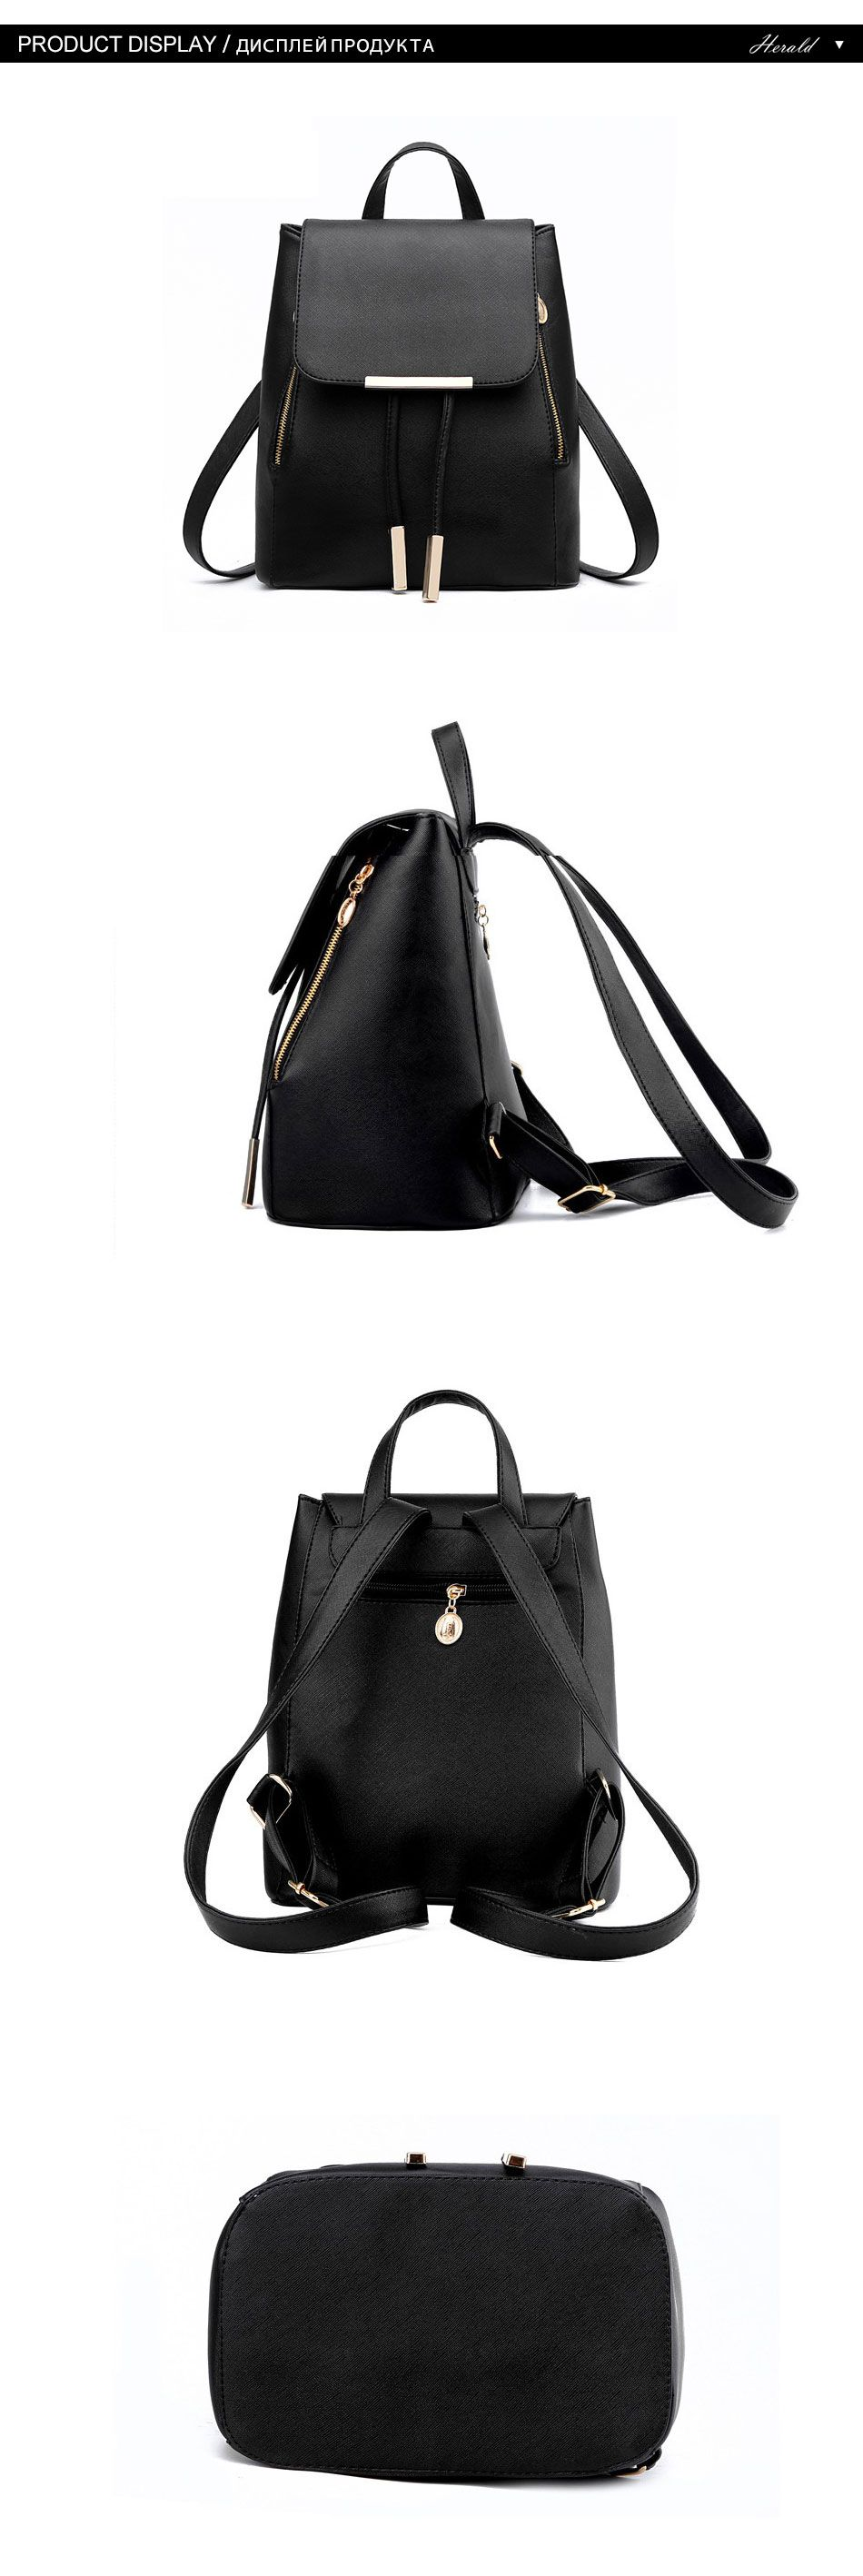 Buy Women Backpack High Quality PU Leather Mochila Escolar School Bags For Teenagers  Girls Top-handle Backpacks Herald Fashion from 14xpress - Best shopping ... 708b89ec7cc1f